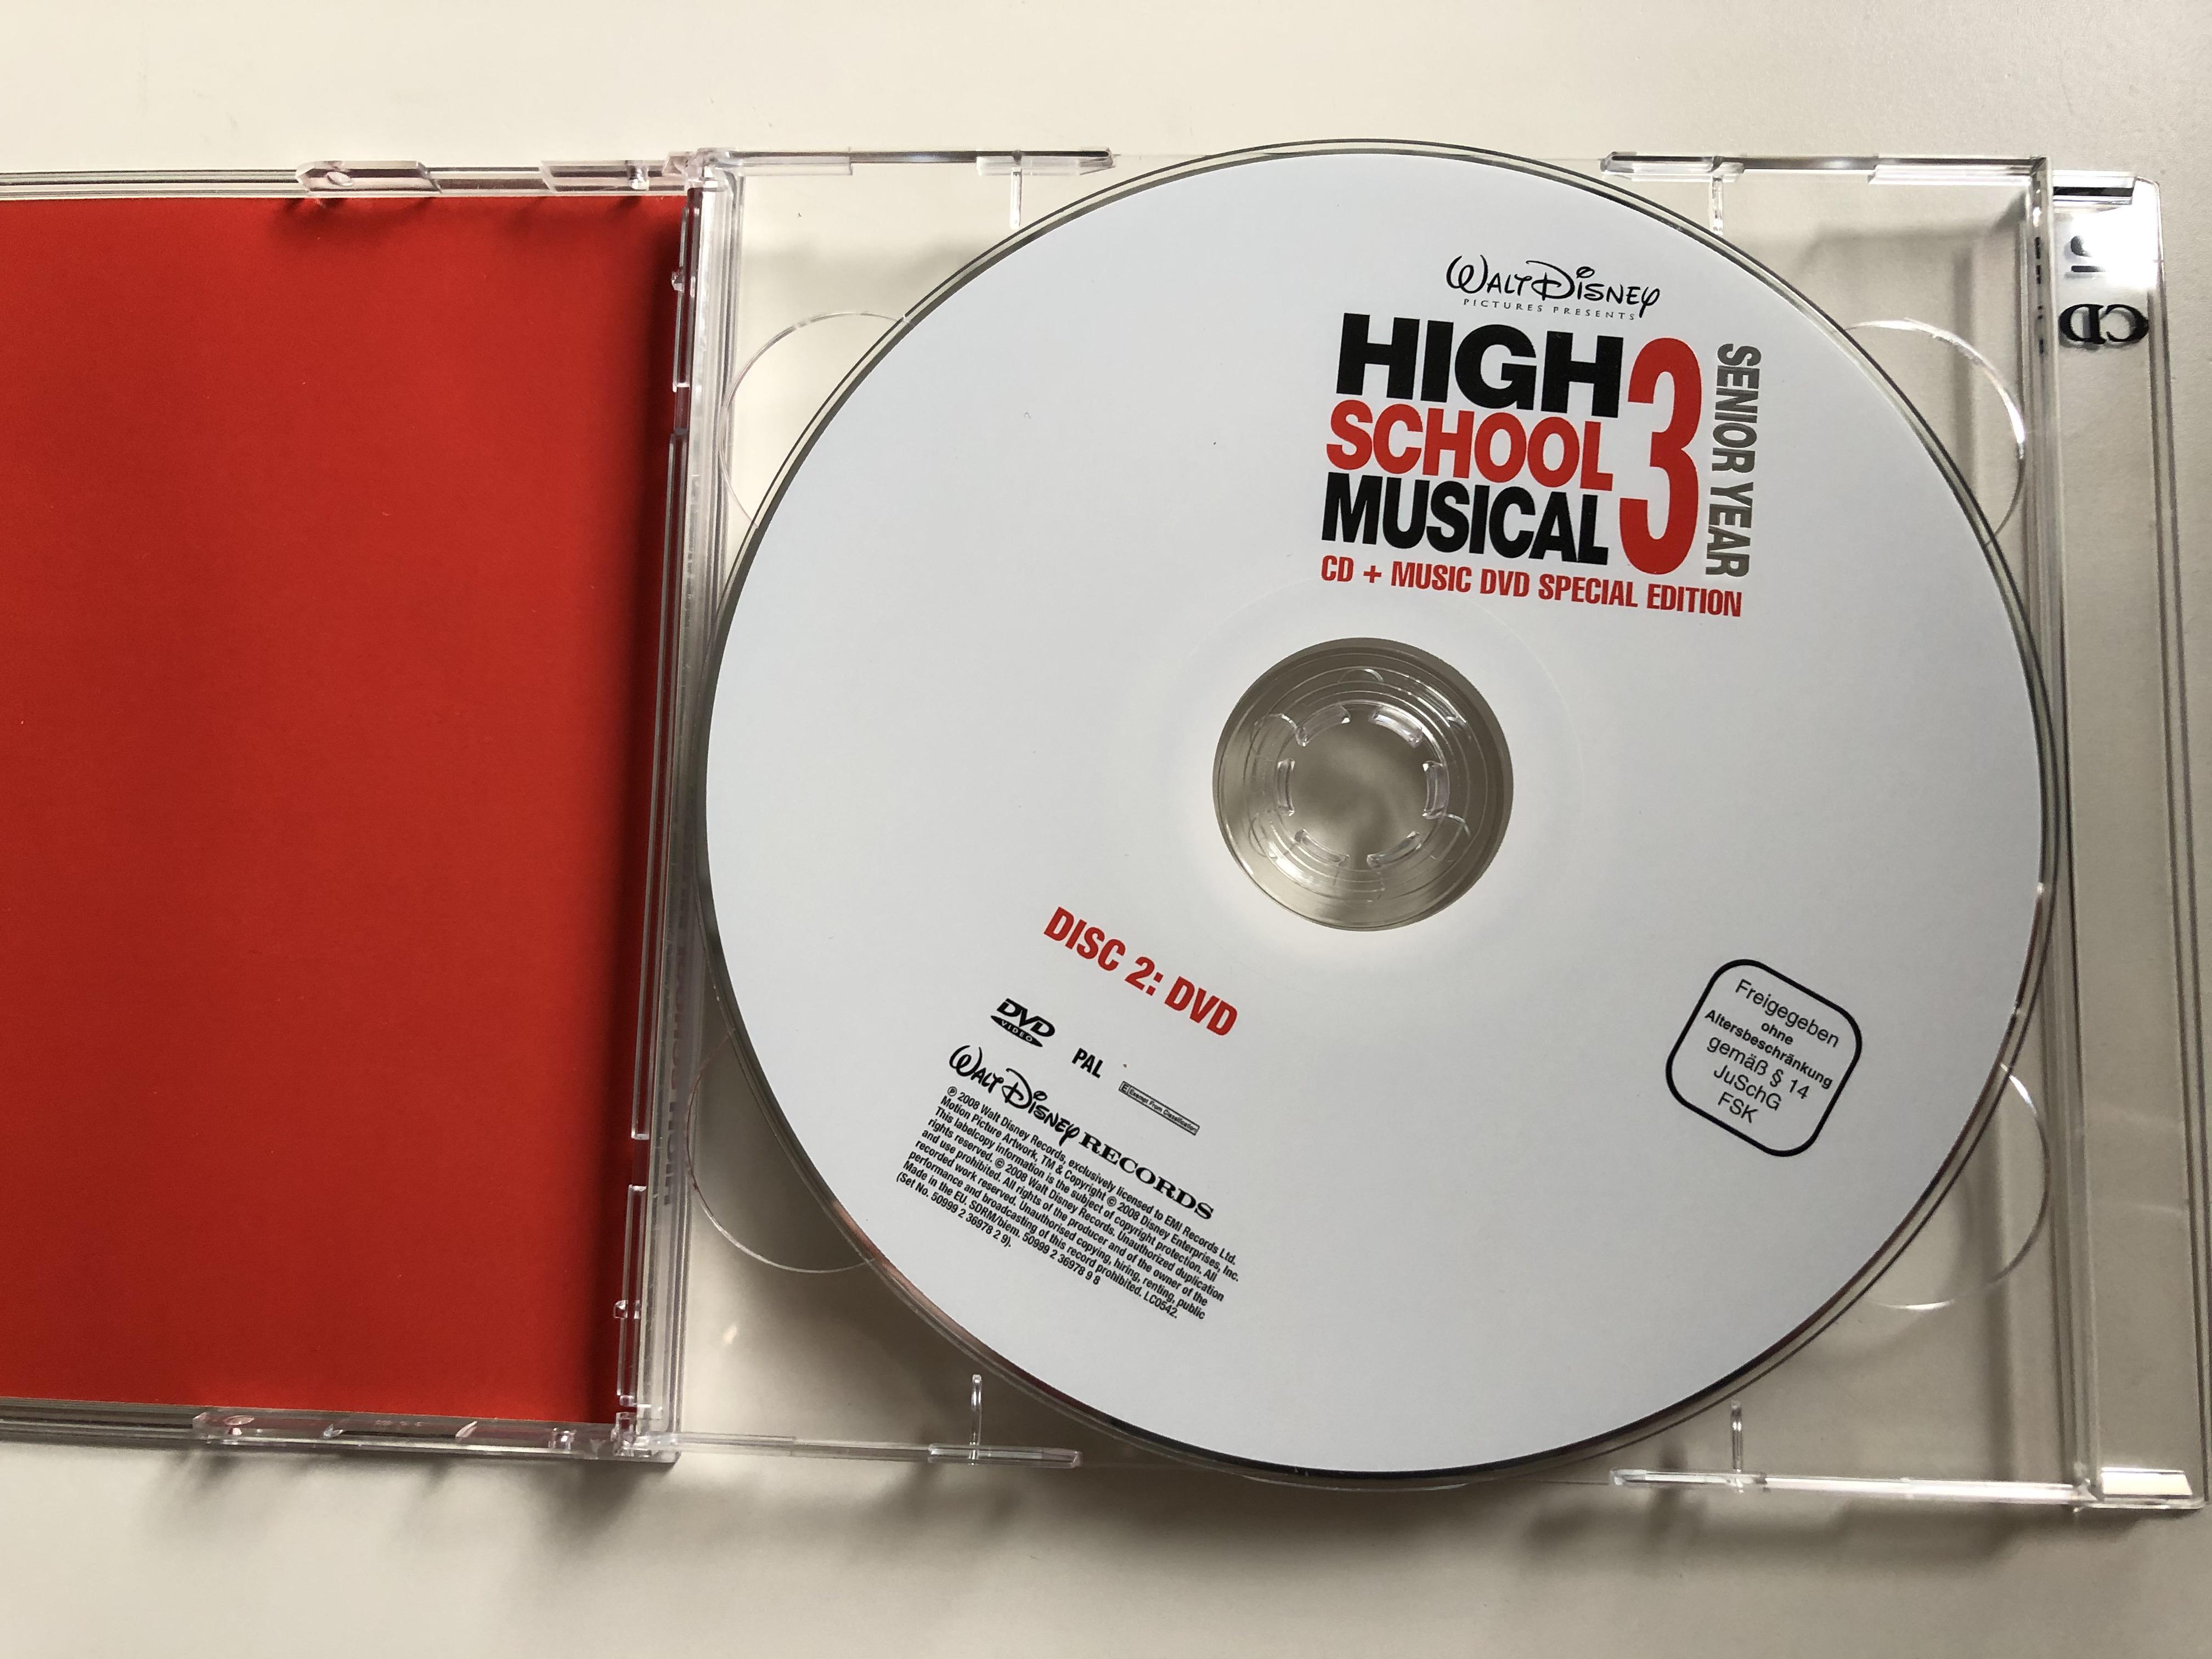 high-school-musical-3-senior-year-walt-disney-records-audio-cd-dvd-cd-special-edition-2008-5099923697829-3-.jpg